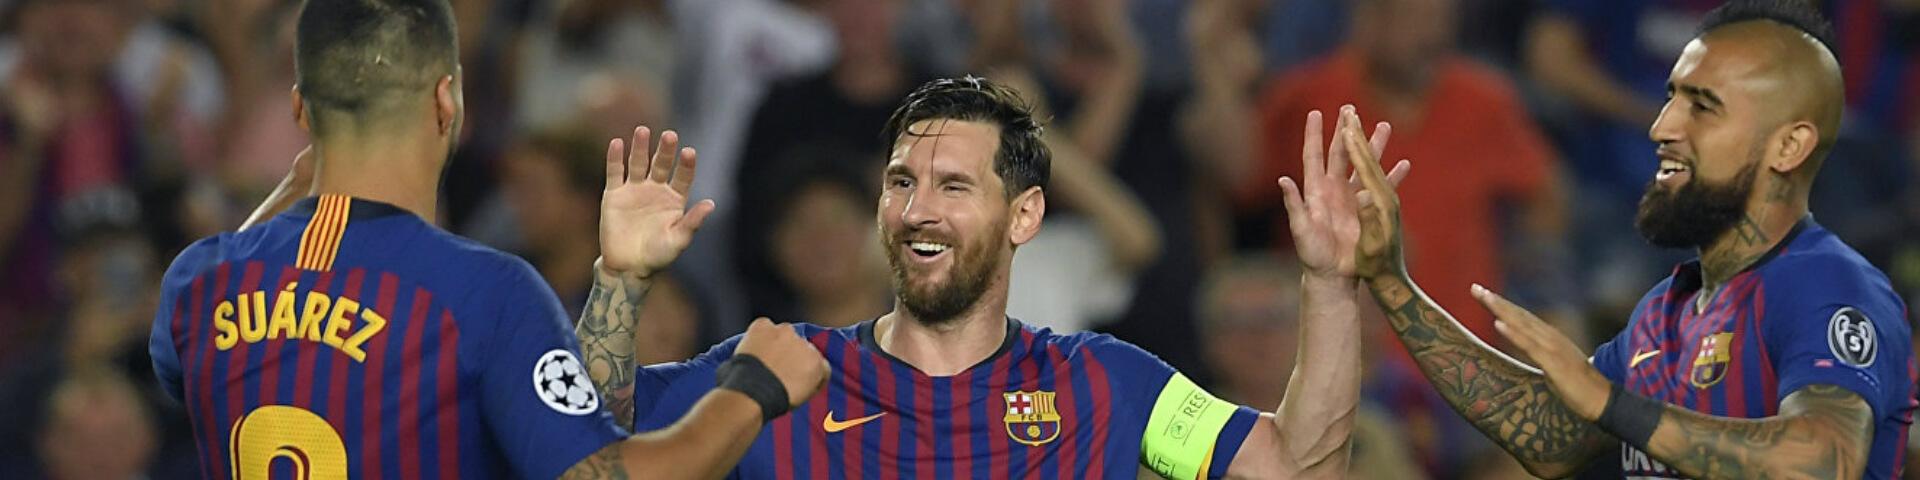 Букмекеры: «Барселона» выиграет у «Манчестер Юнайтед»